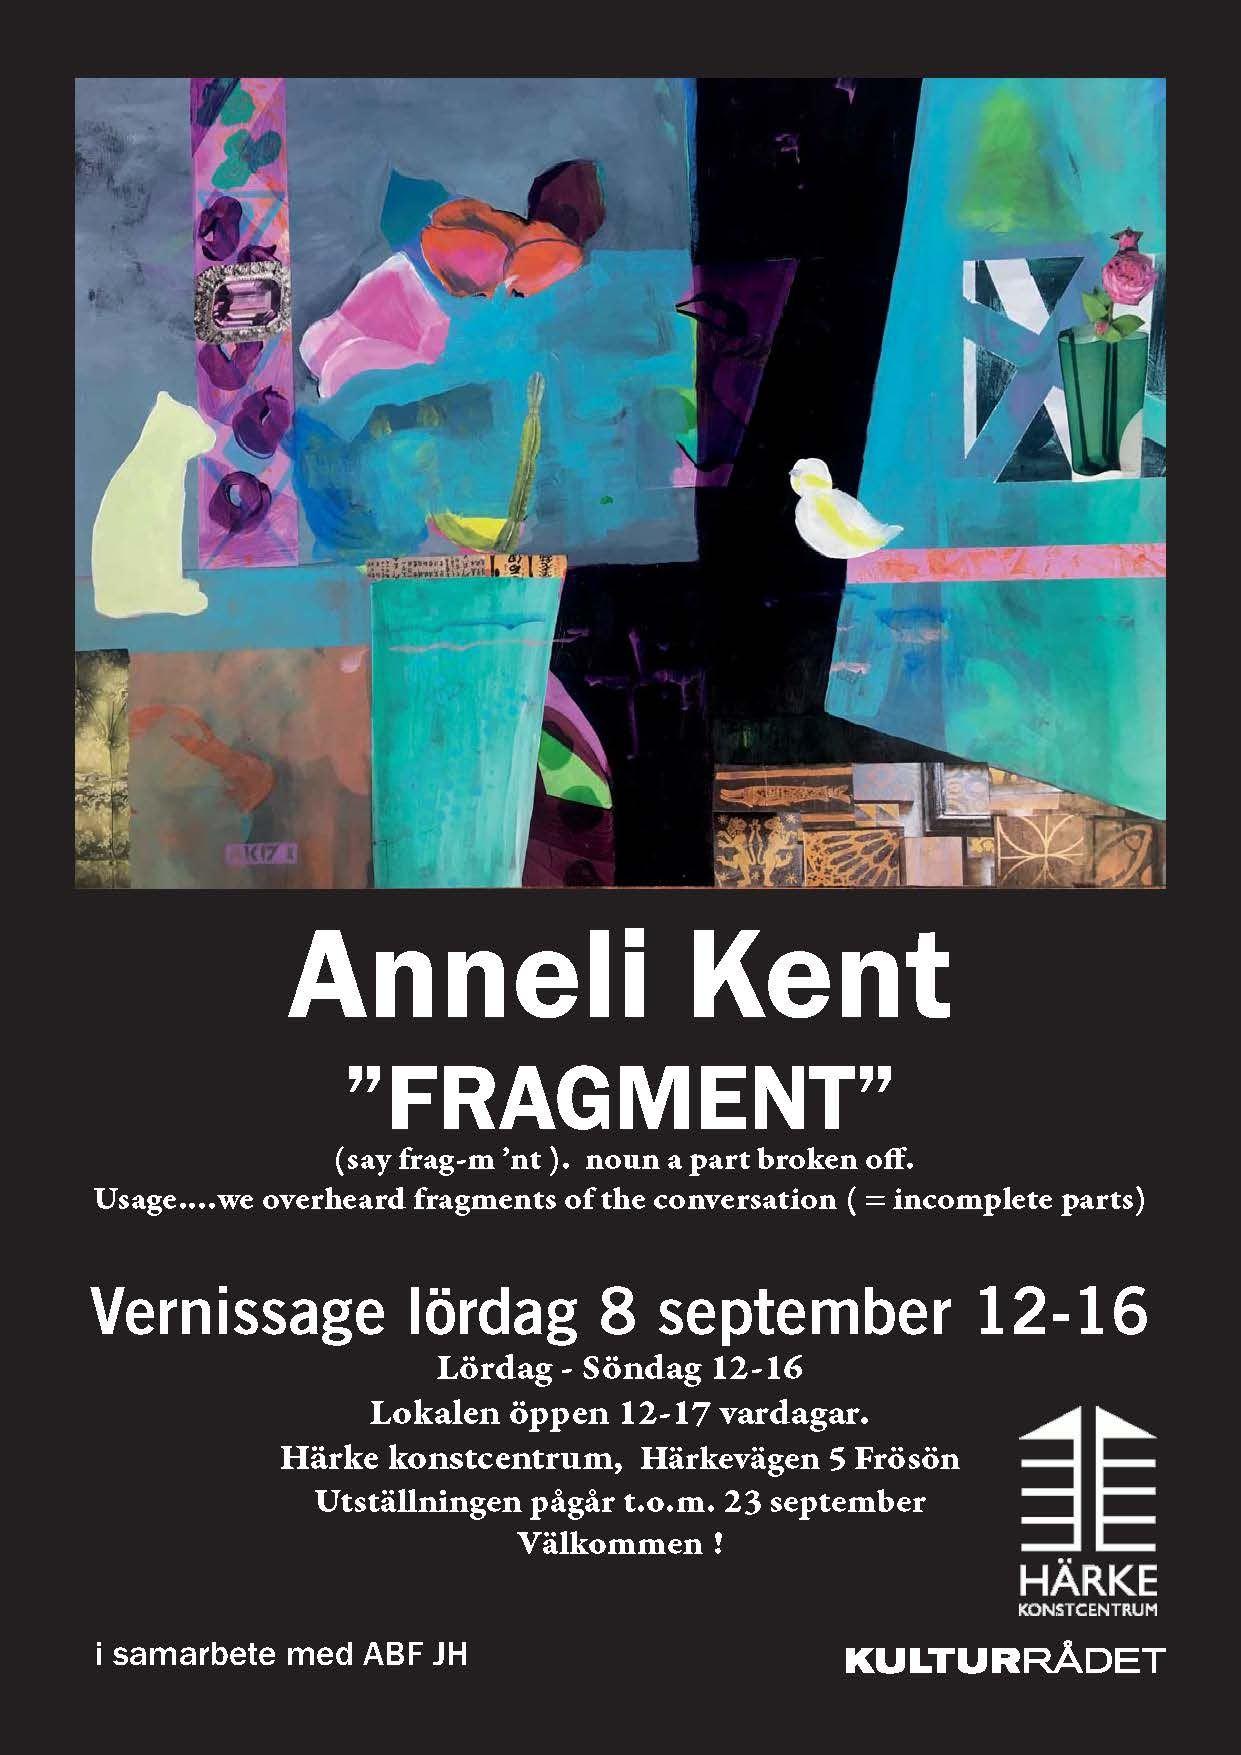 © Härke Konstcentrum, Exhibition Anneli Kent